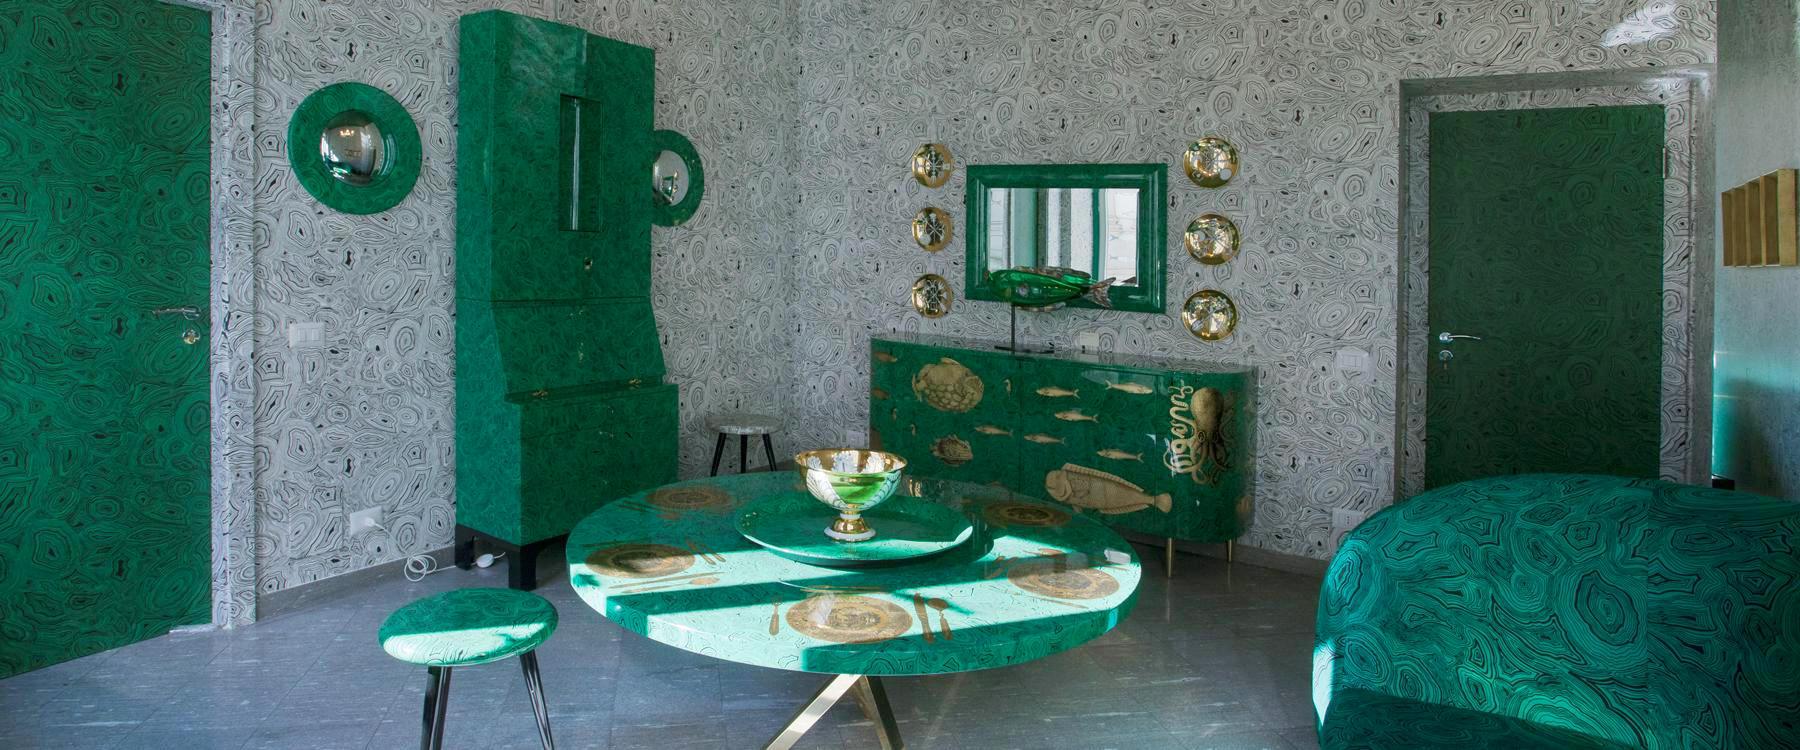 01new-fornasetti-salon